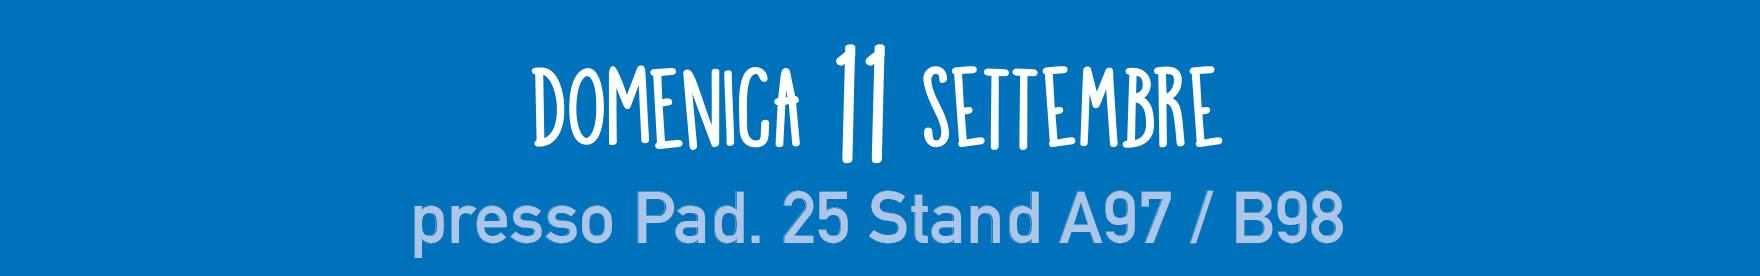 Sana bologna lucia cuffaro for Sana bologna 2016